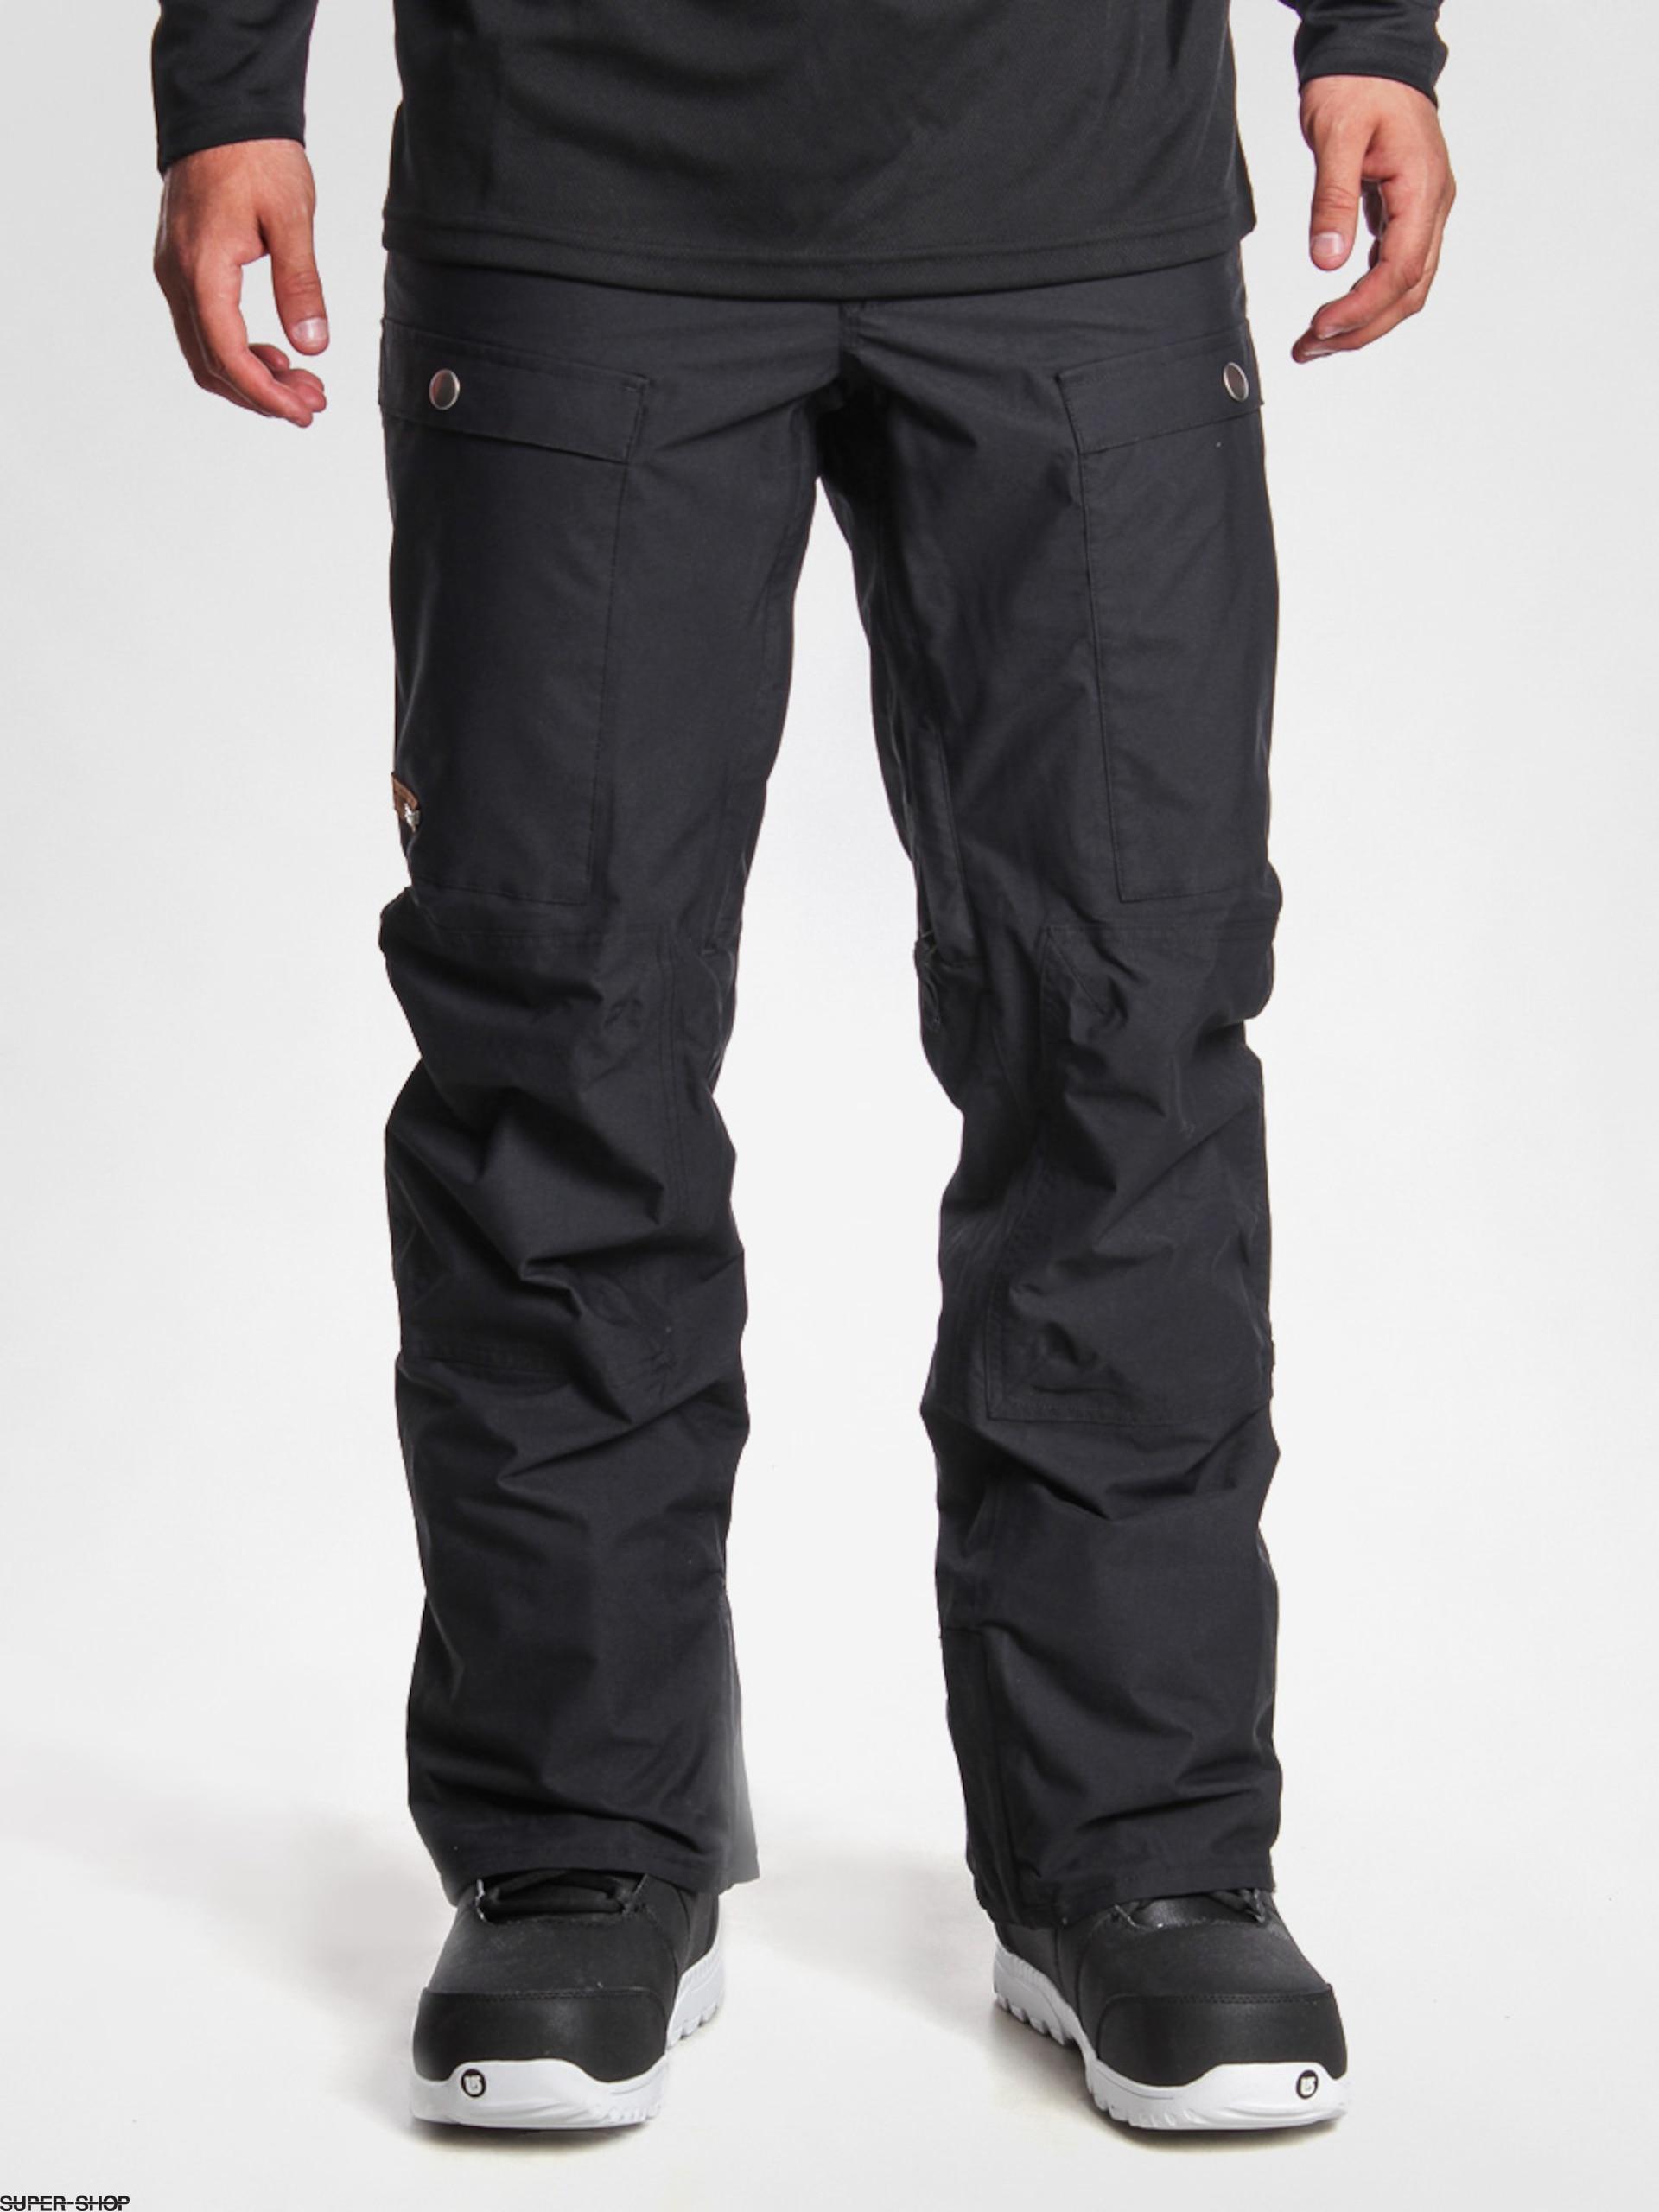 66ad634b6d1e Burton Snowboard pants RA Wiggle Wagon (true black)